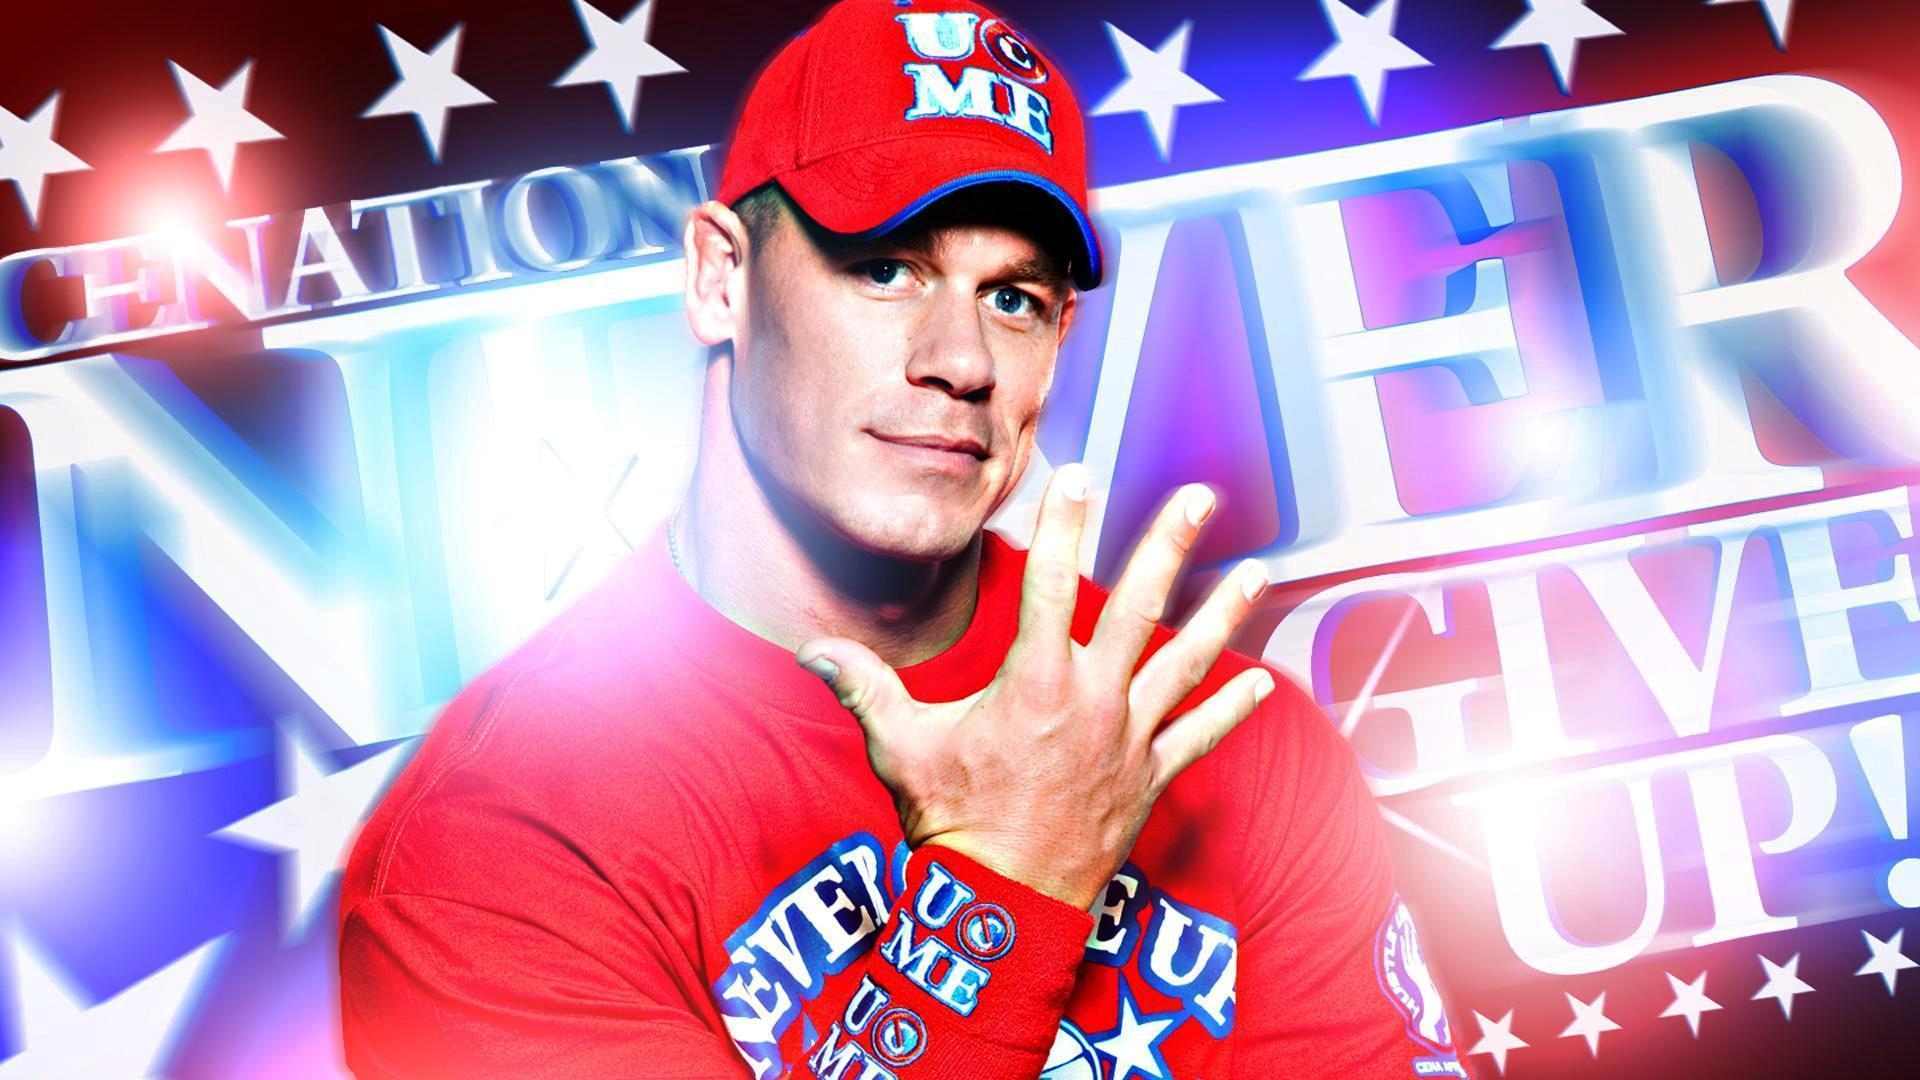 John Cena Desktop Background